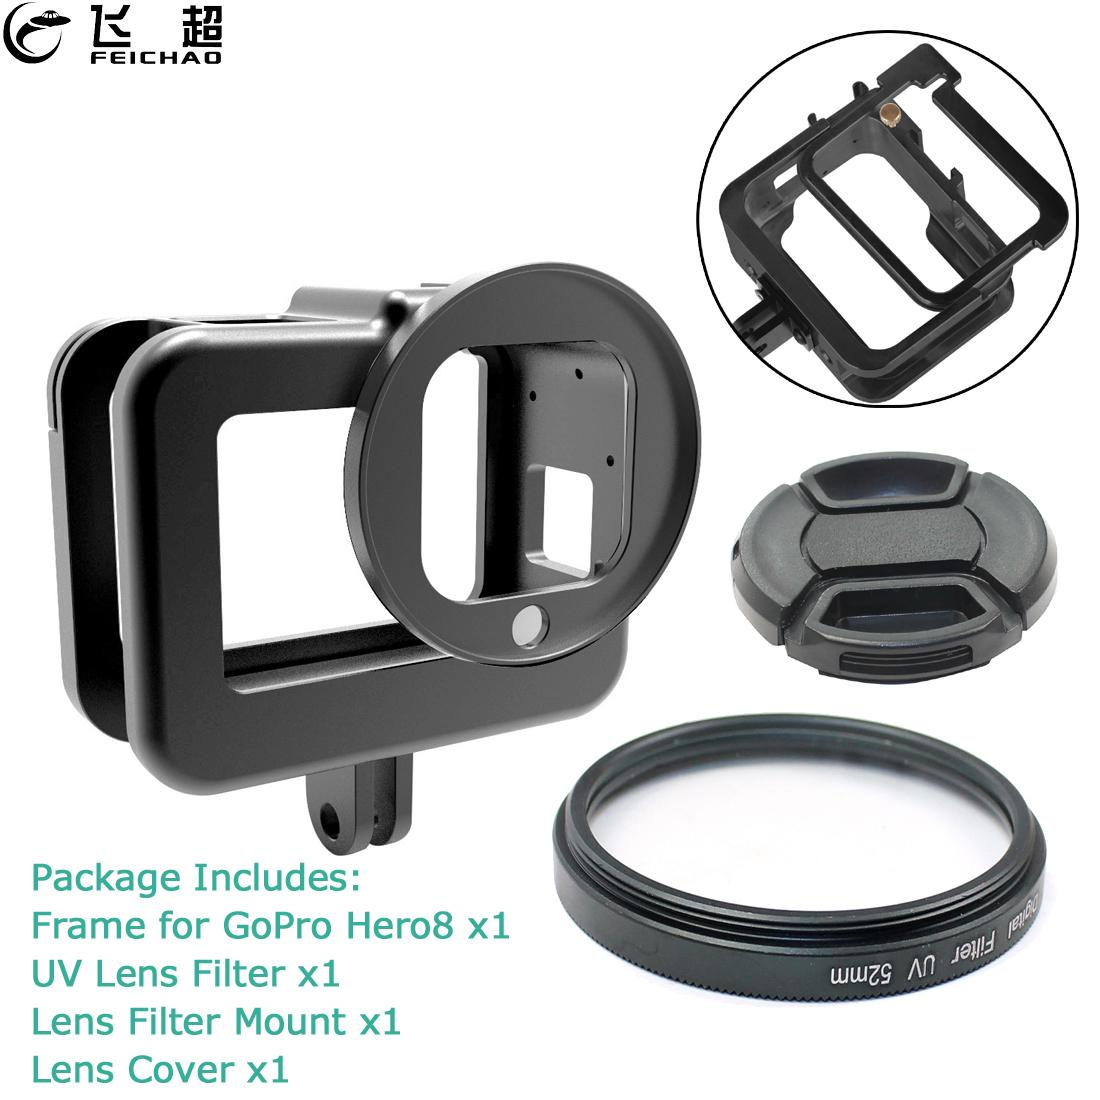 CNC Protective Case For GoPro Hero 8 Black Aluminum Frame Cage Mount Hot Shoe + UV Lens Filter For Go Pro 8 Camera Accessories